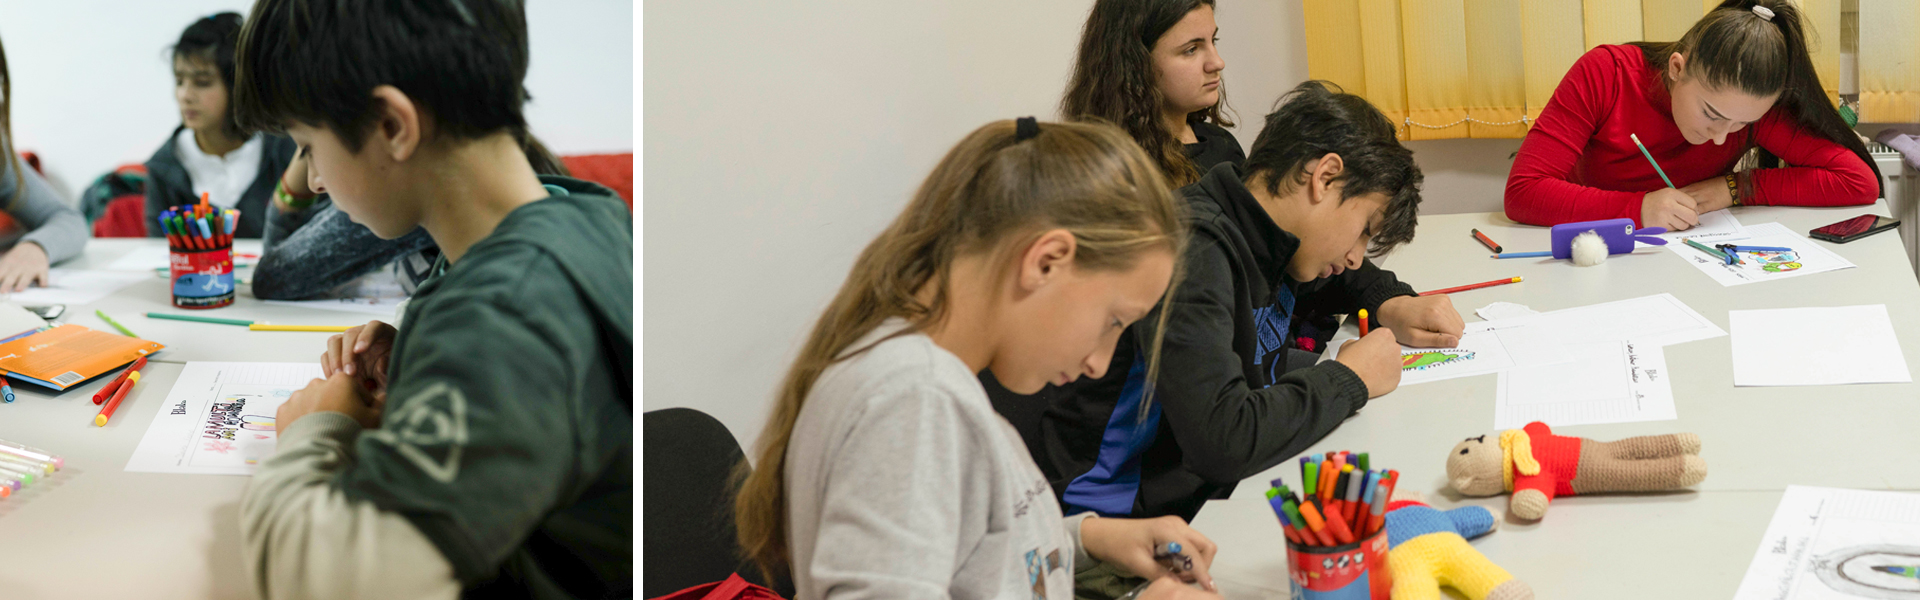 Romania Orphanage Gallery 3